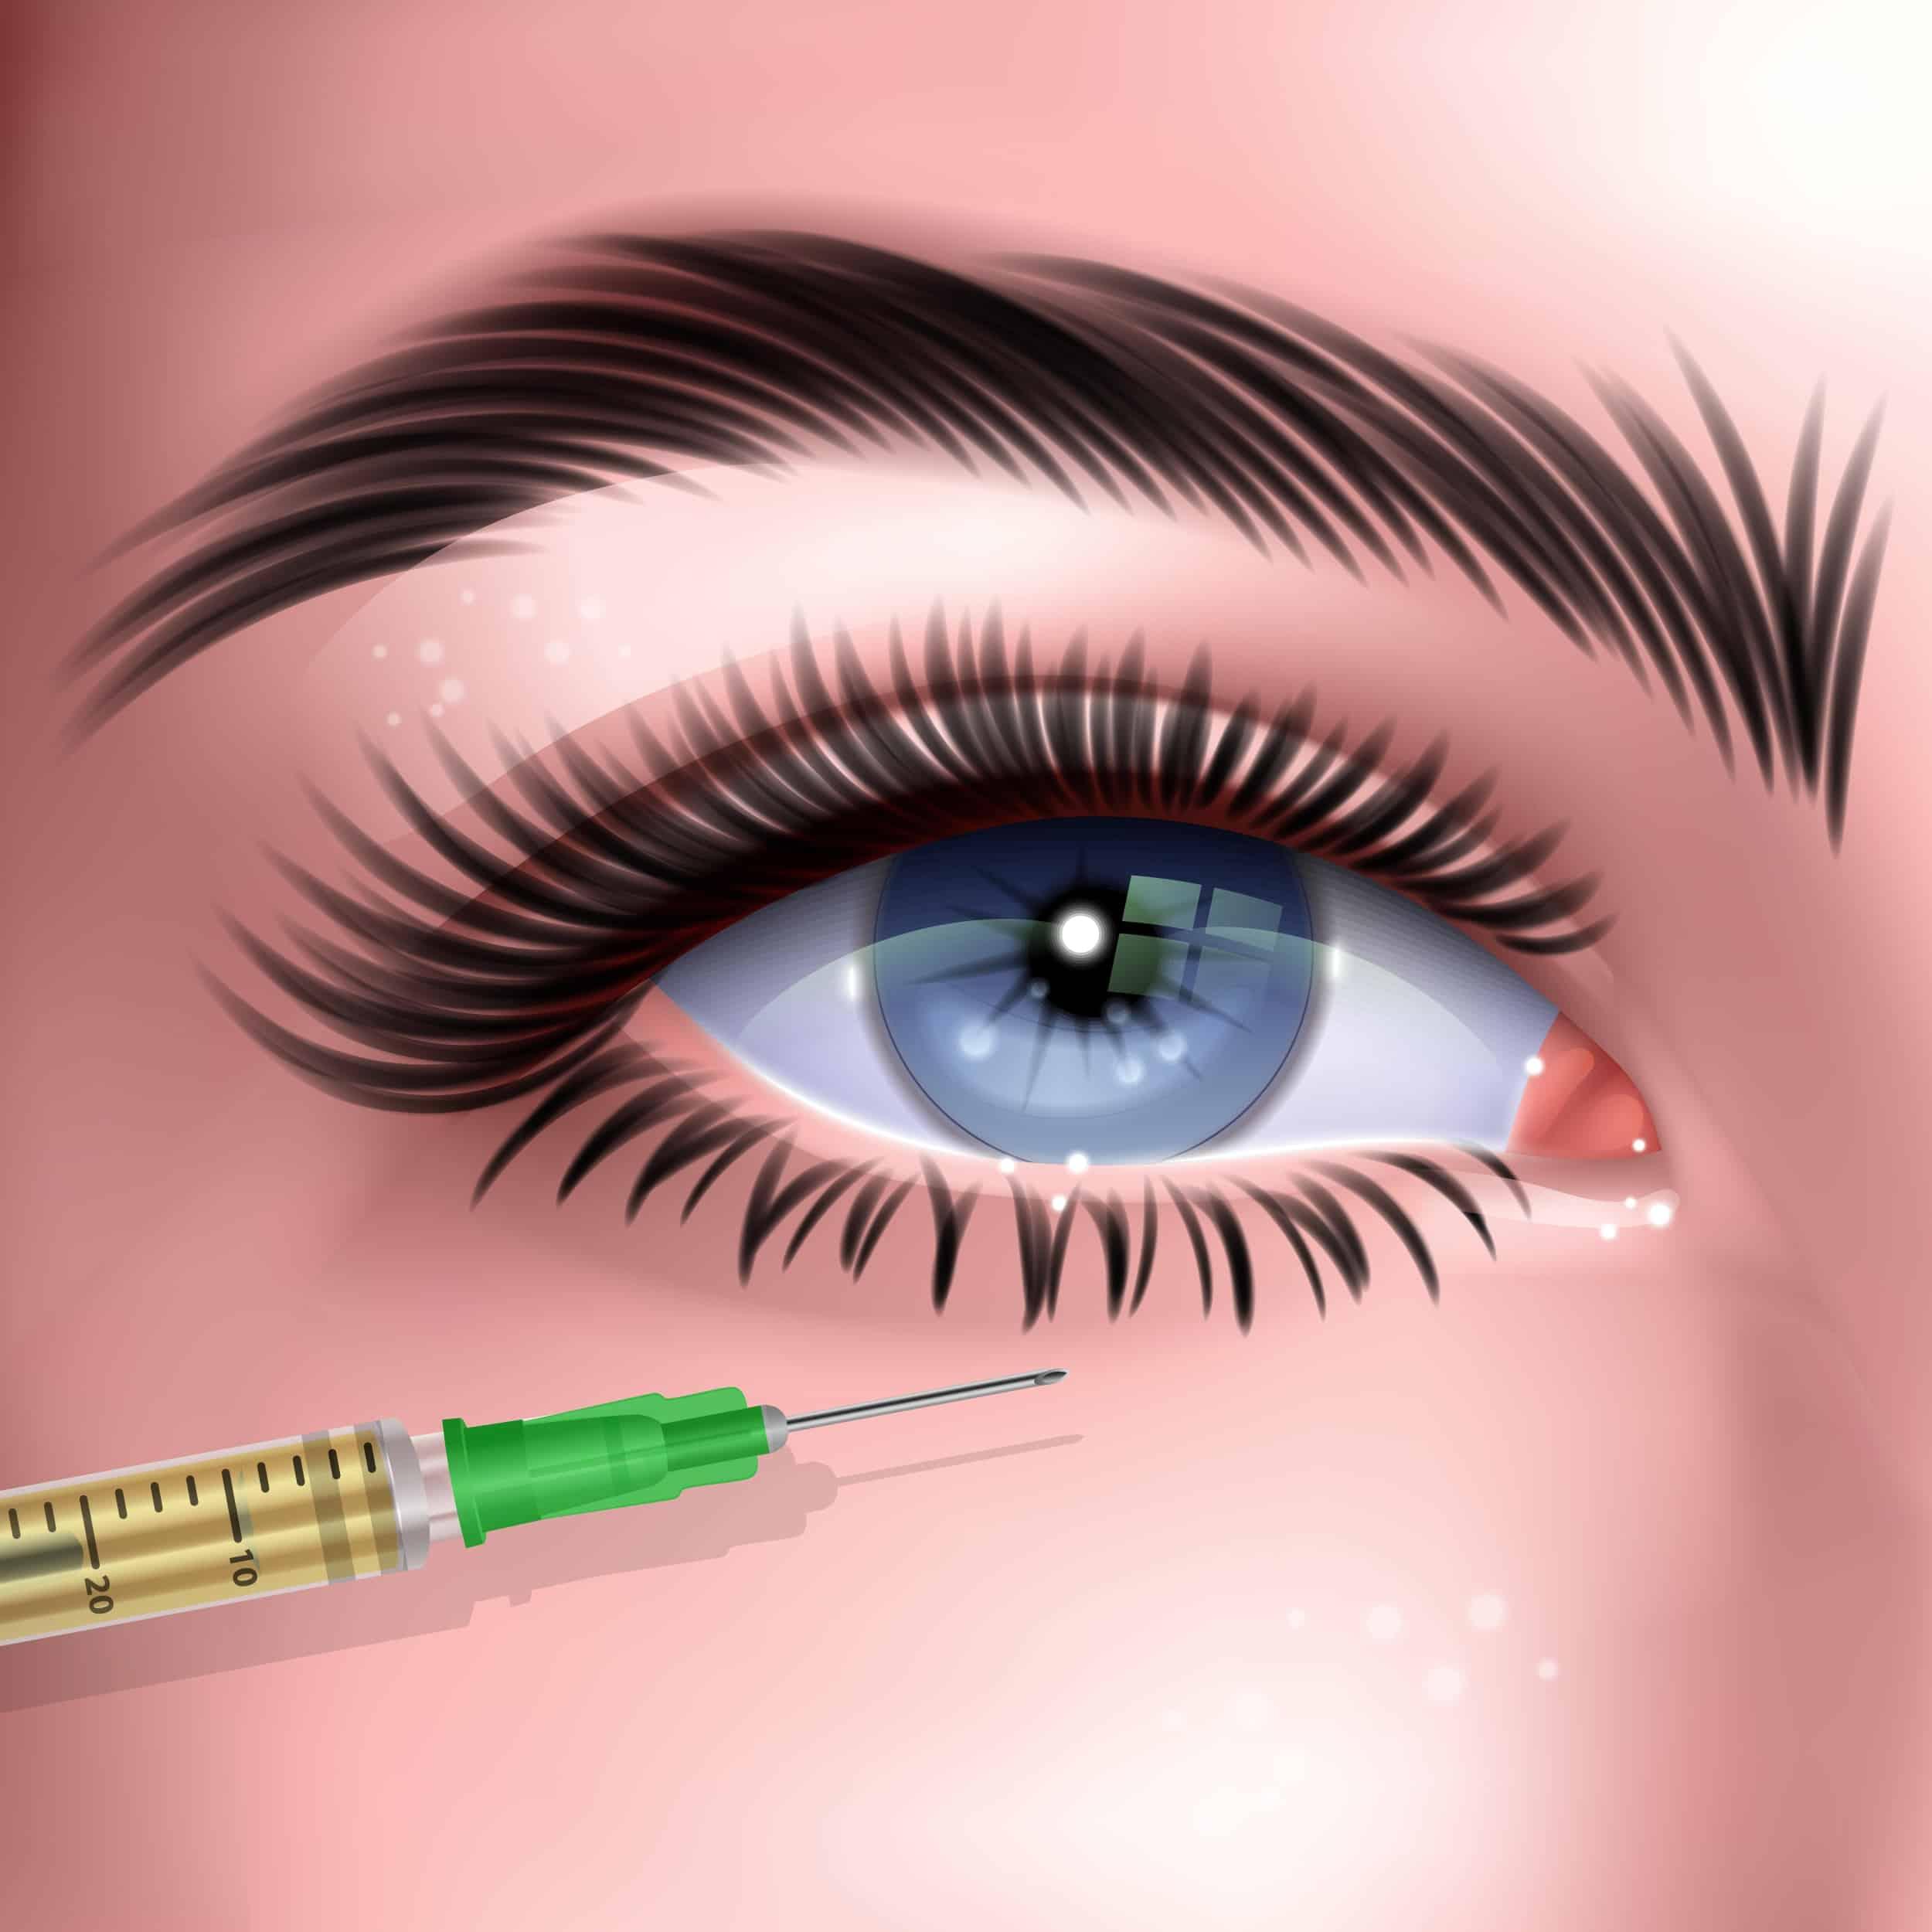 intraviteralne injekcije ocna poliklinika medic jukic